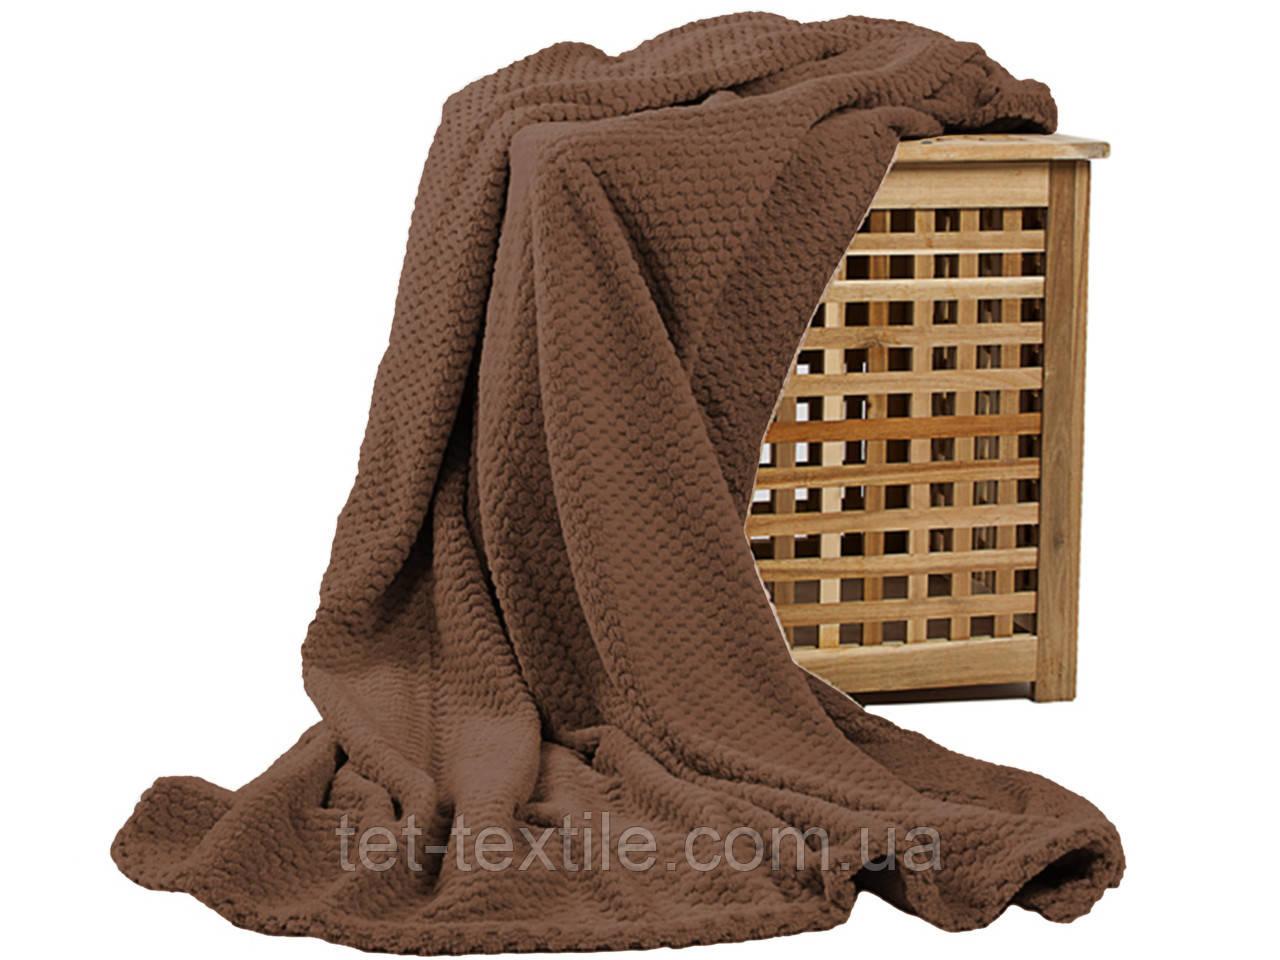 Плед из бамбукового волокна Koloco коричневый (180х220)